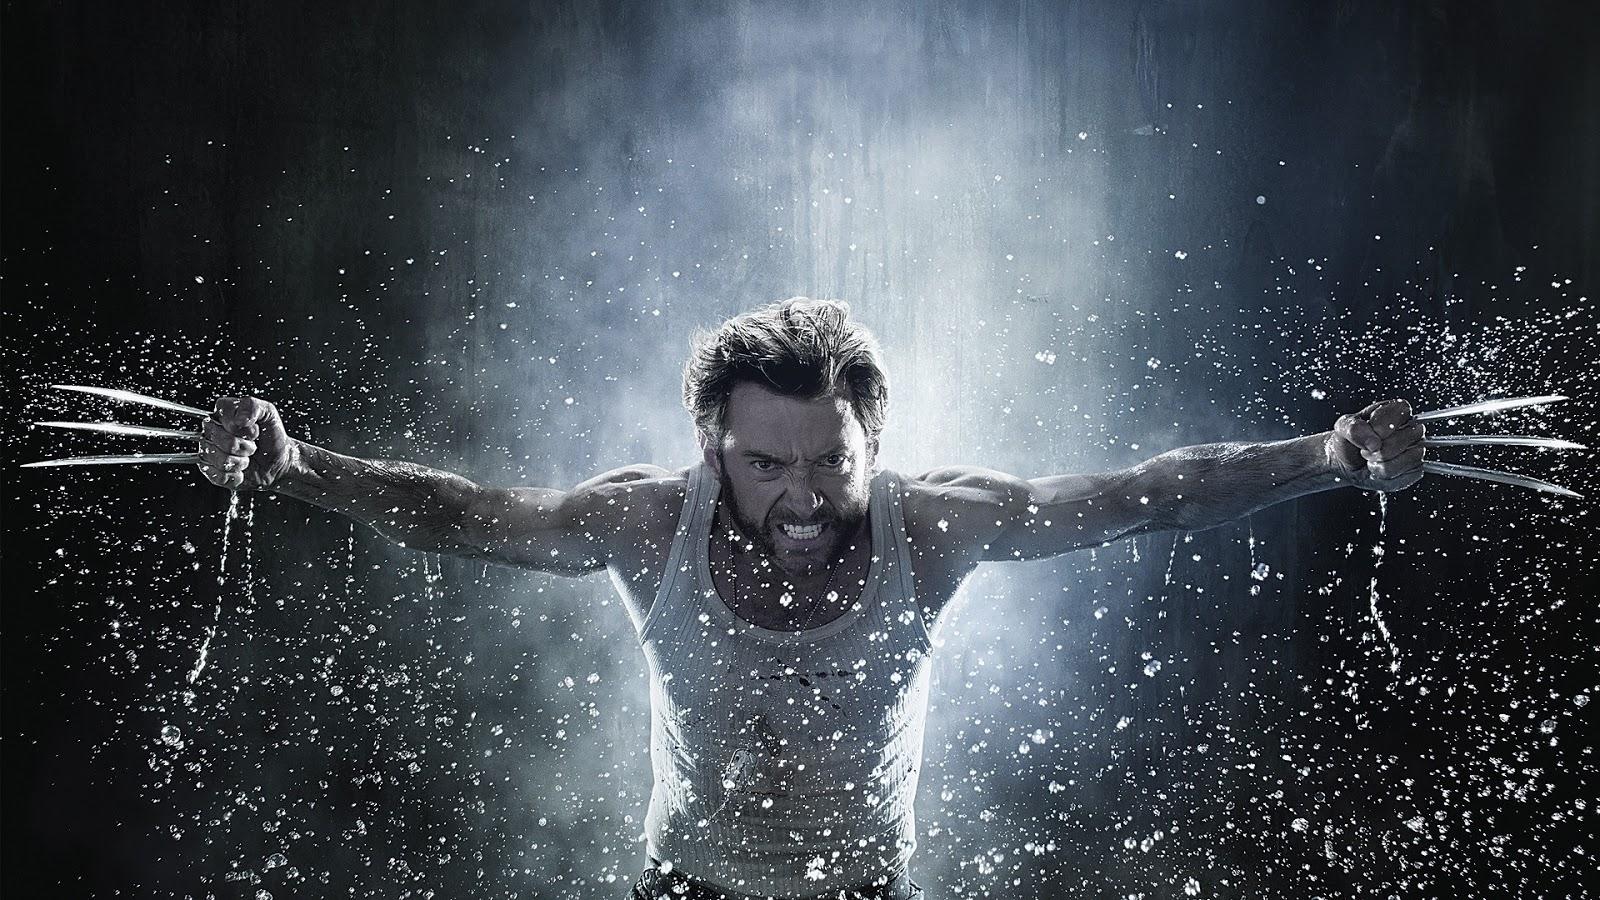 X Man Wolverine 2 Full High Definition Wallpaper Free Download Hd